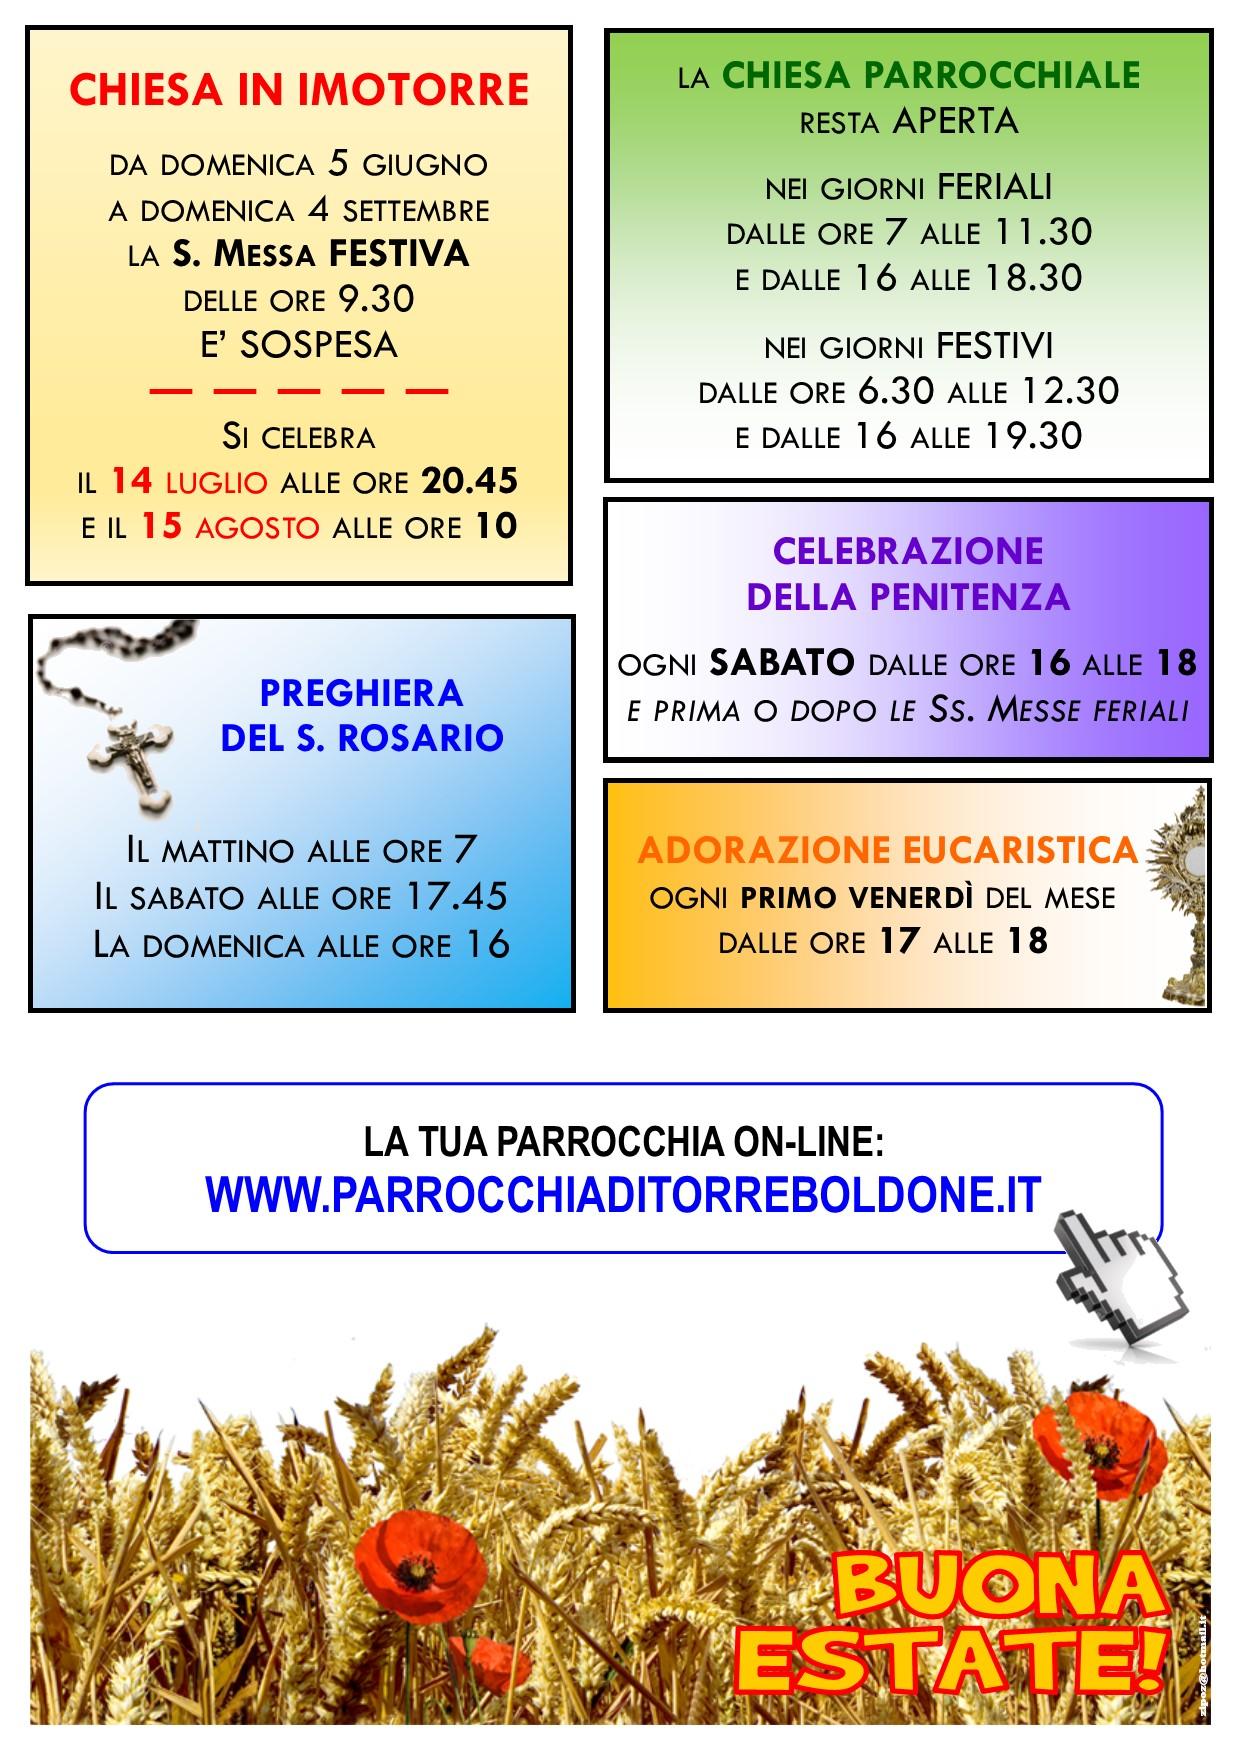 ORARIO ESTIVO MESSE 2016 P2